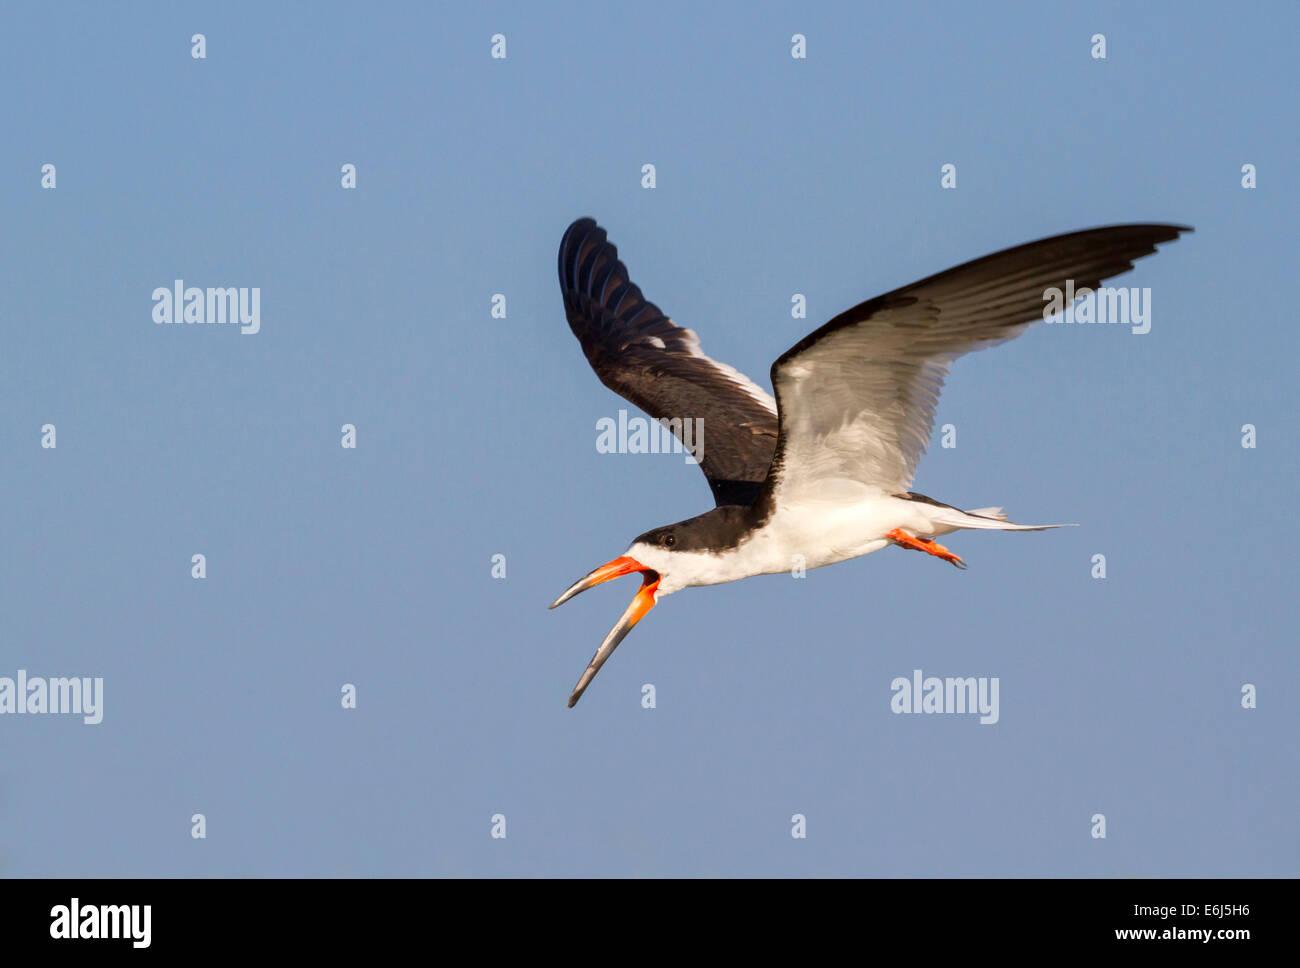 Black skimmer (Rynchops niger) flying. - Stock Image